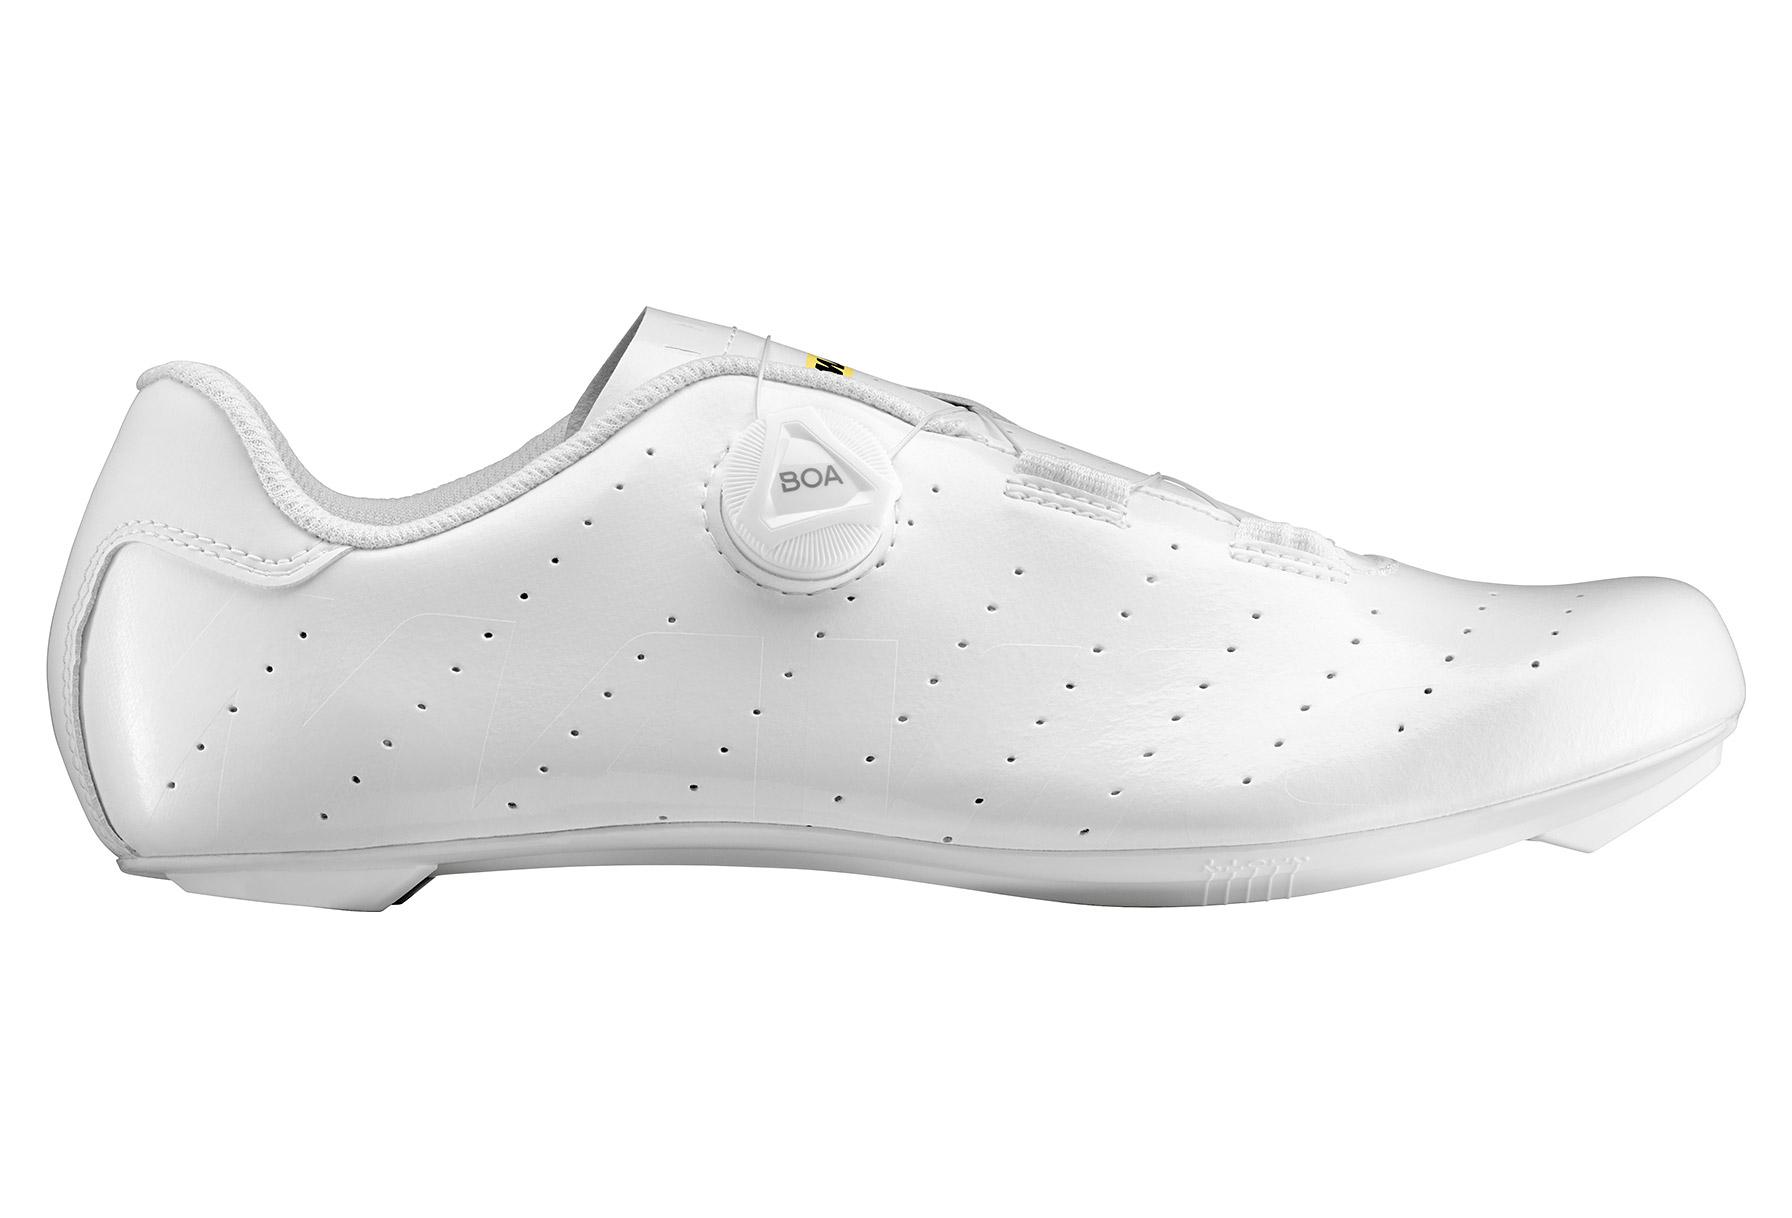 Blanc Mavic Boa Cosmic Chaussures Route sQohCtrdxB